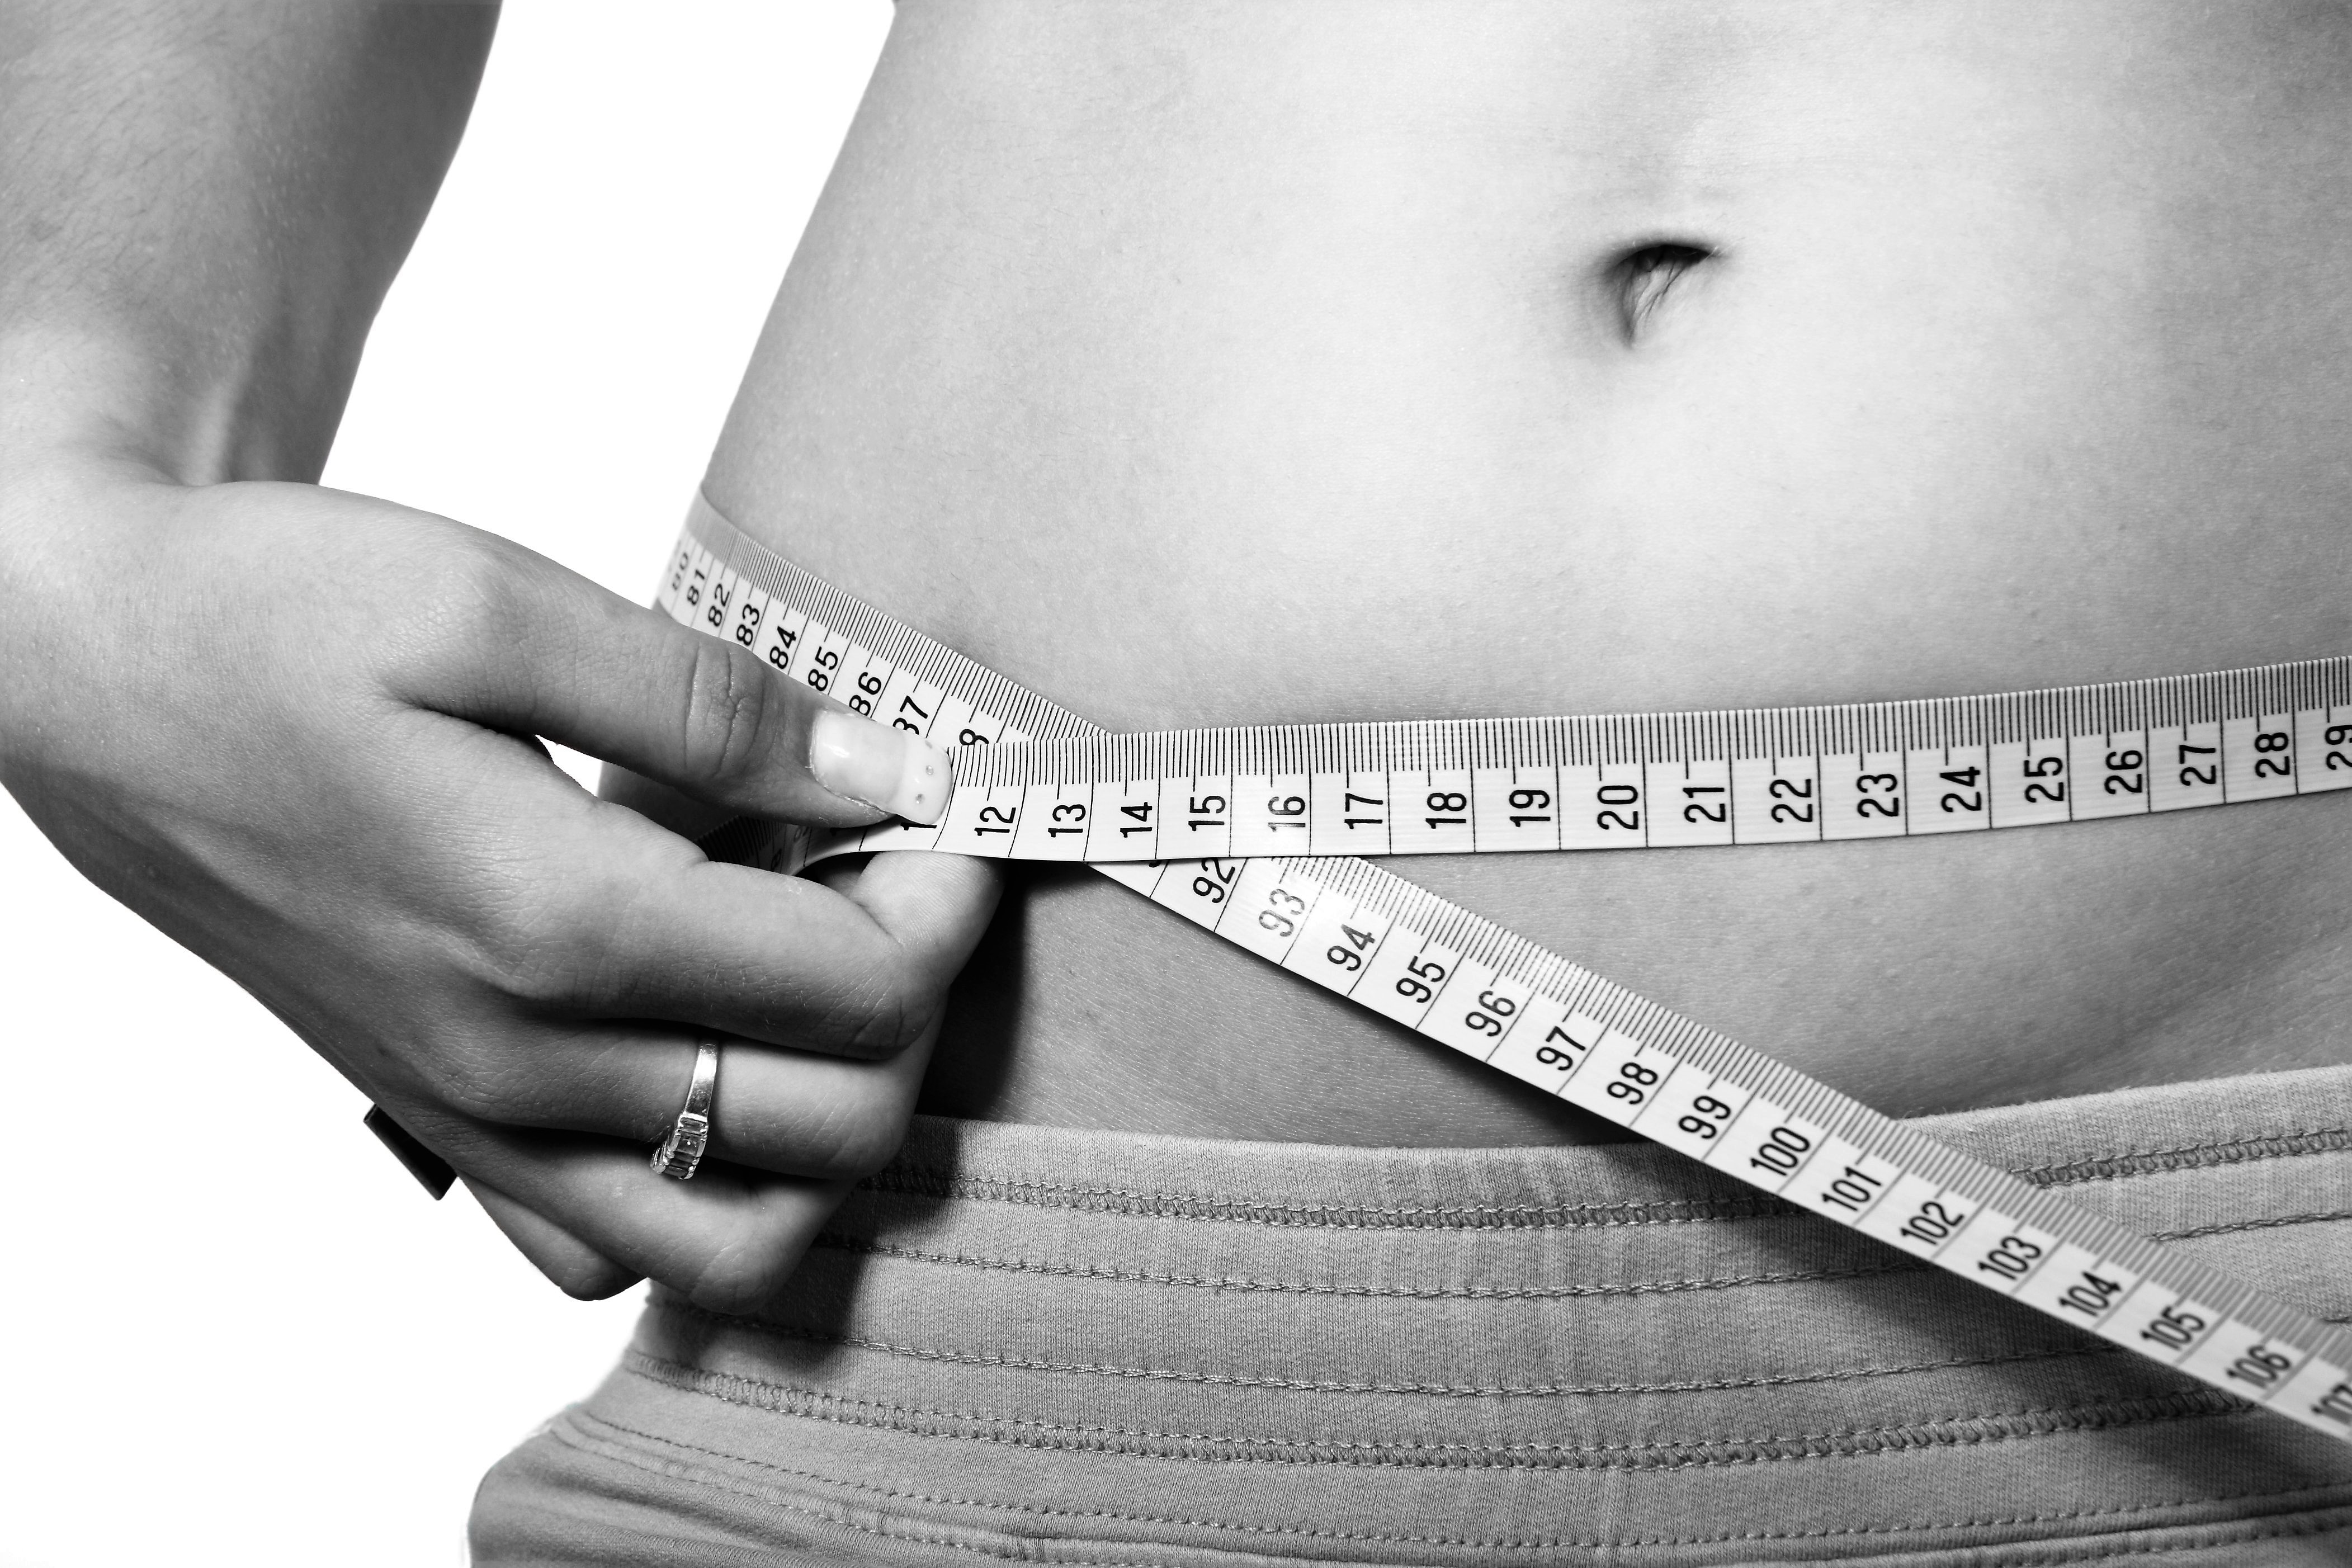 Nuo 95 kg iki 60 kg svorio